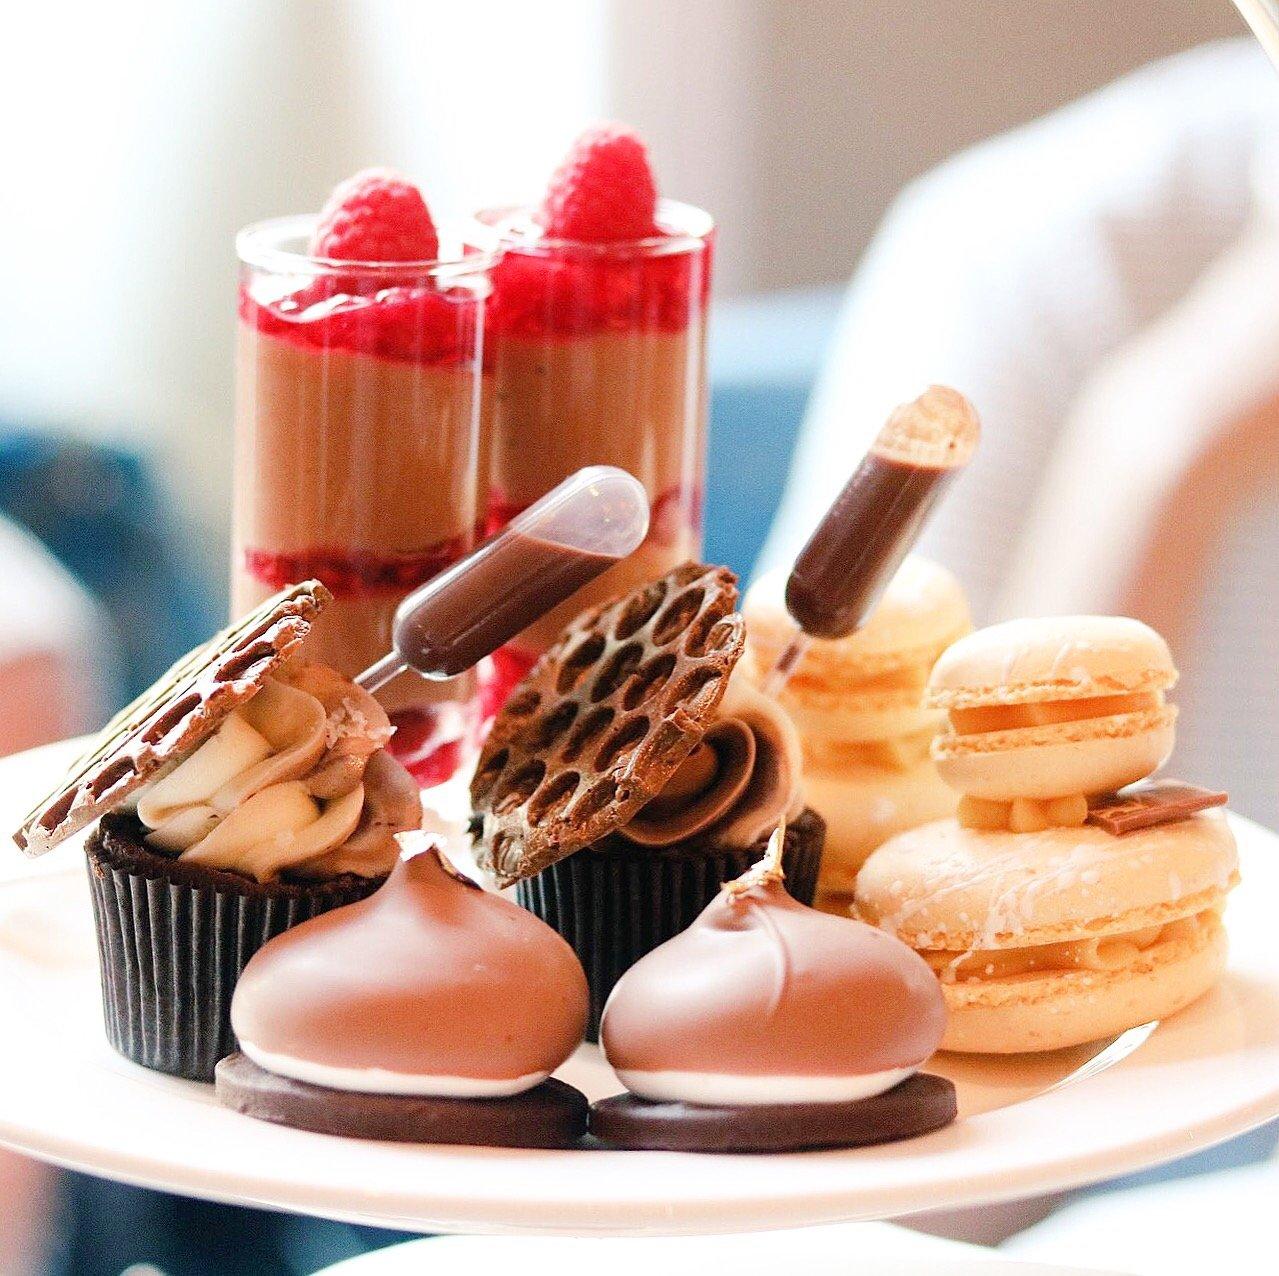 An indulgent ChocolaTEA at The Montagu at Hyatt Regency London – The Churchill